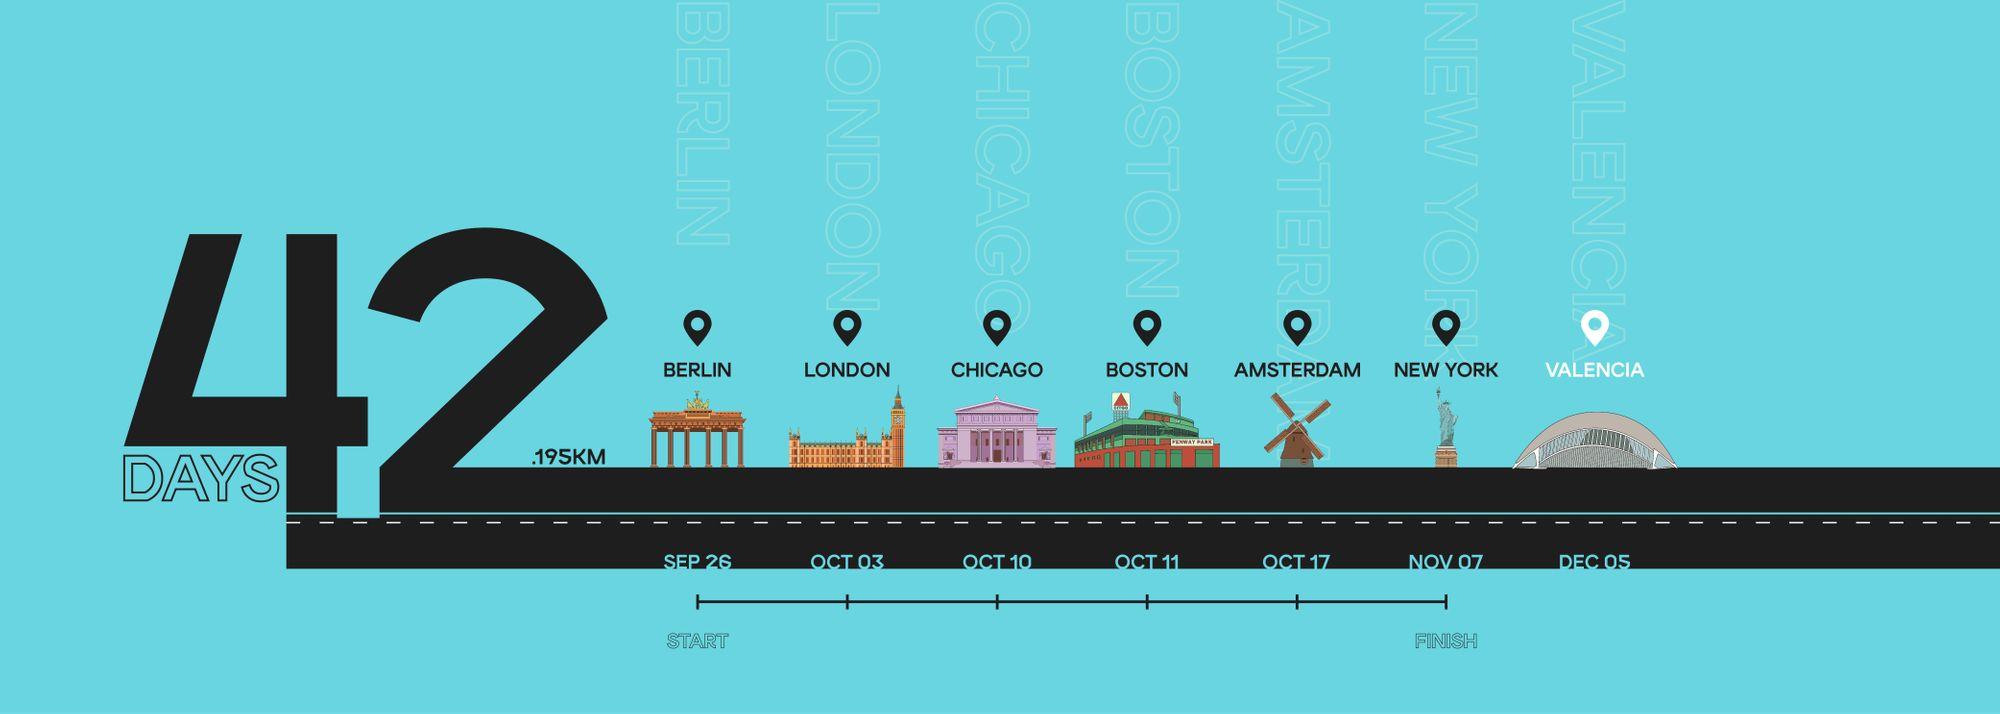 Big city marathon action returns later this week